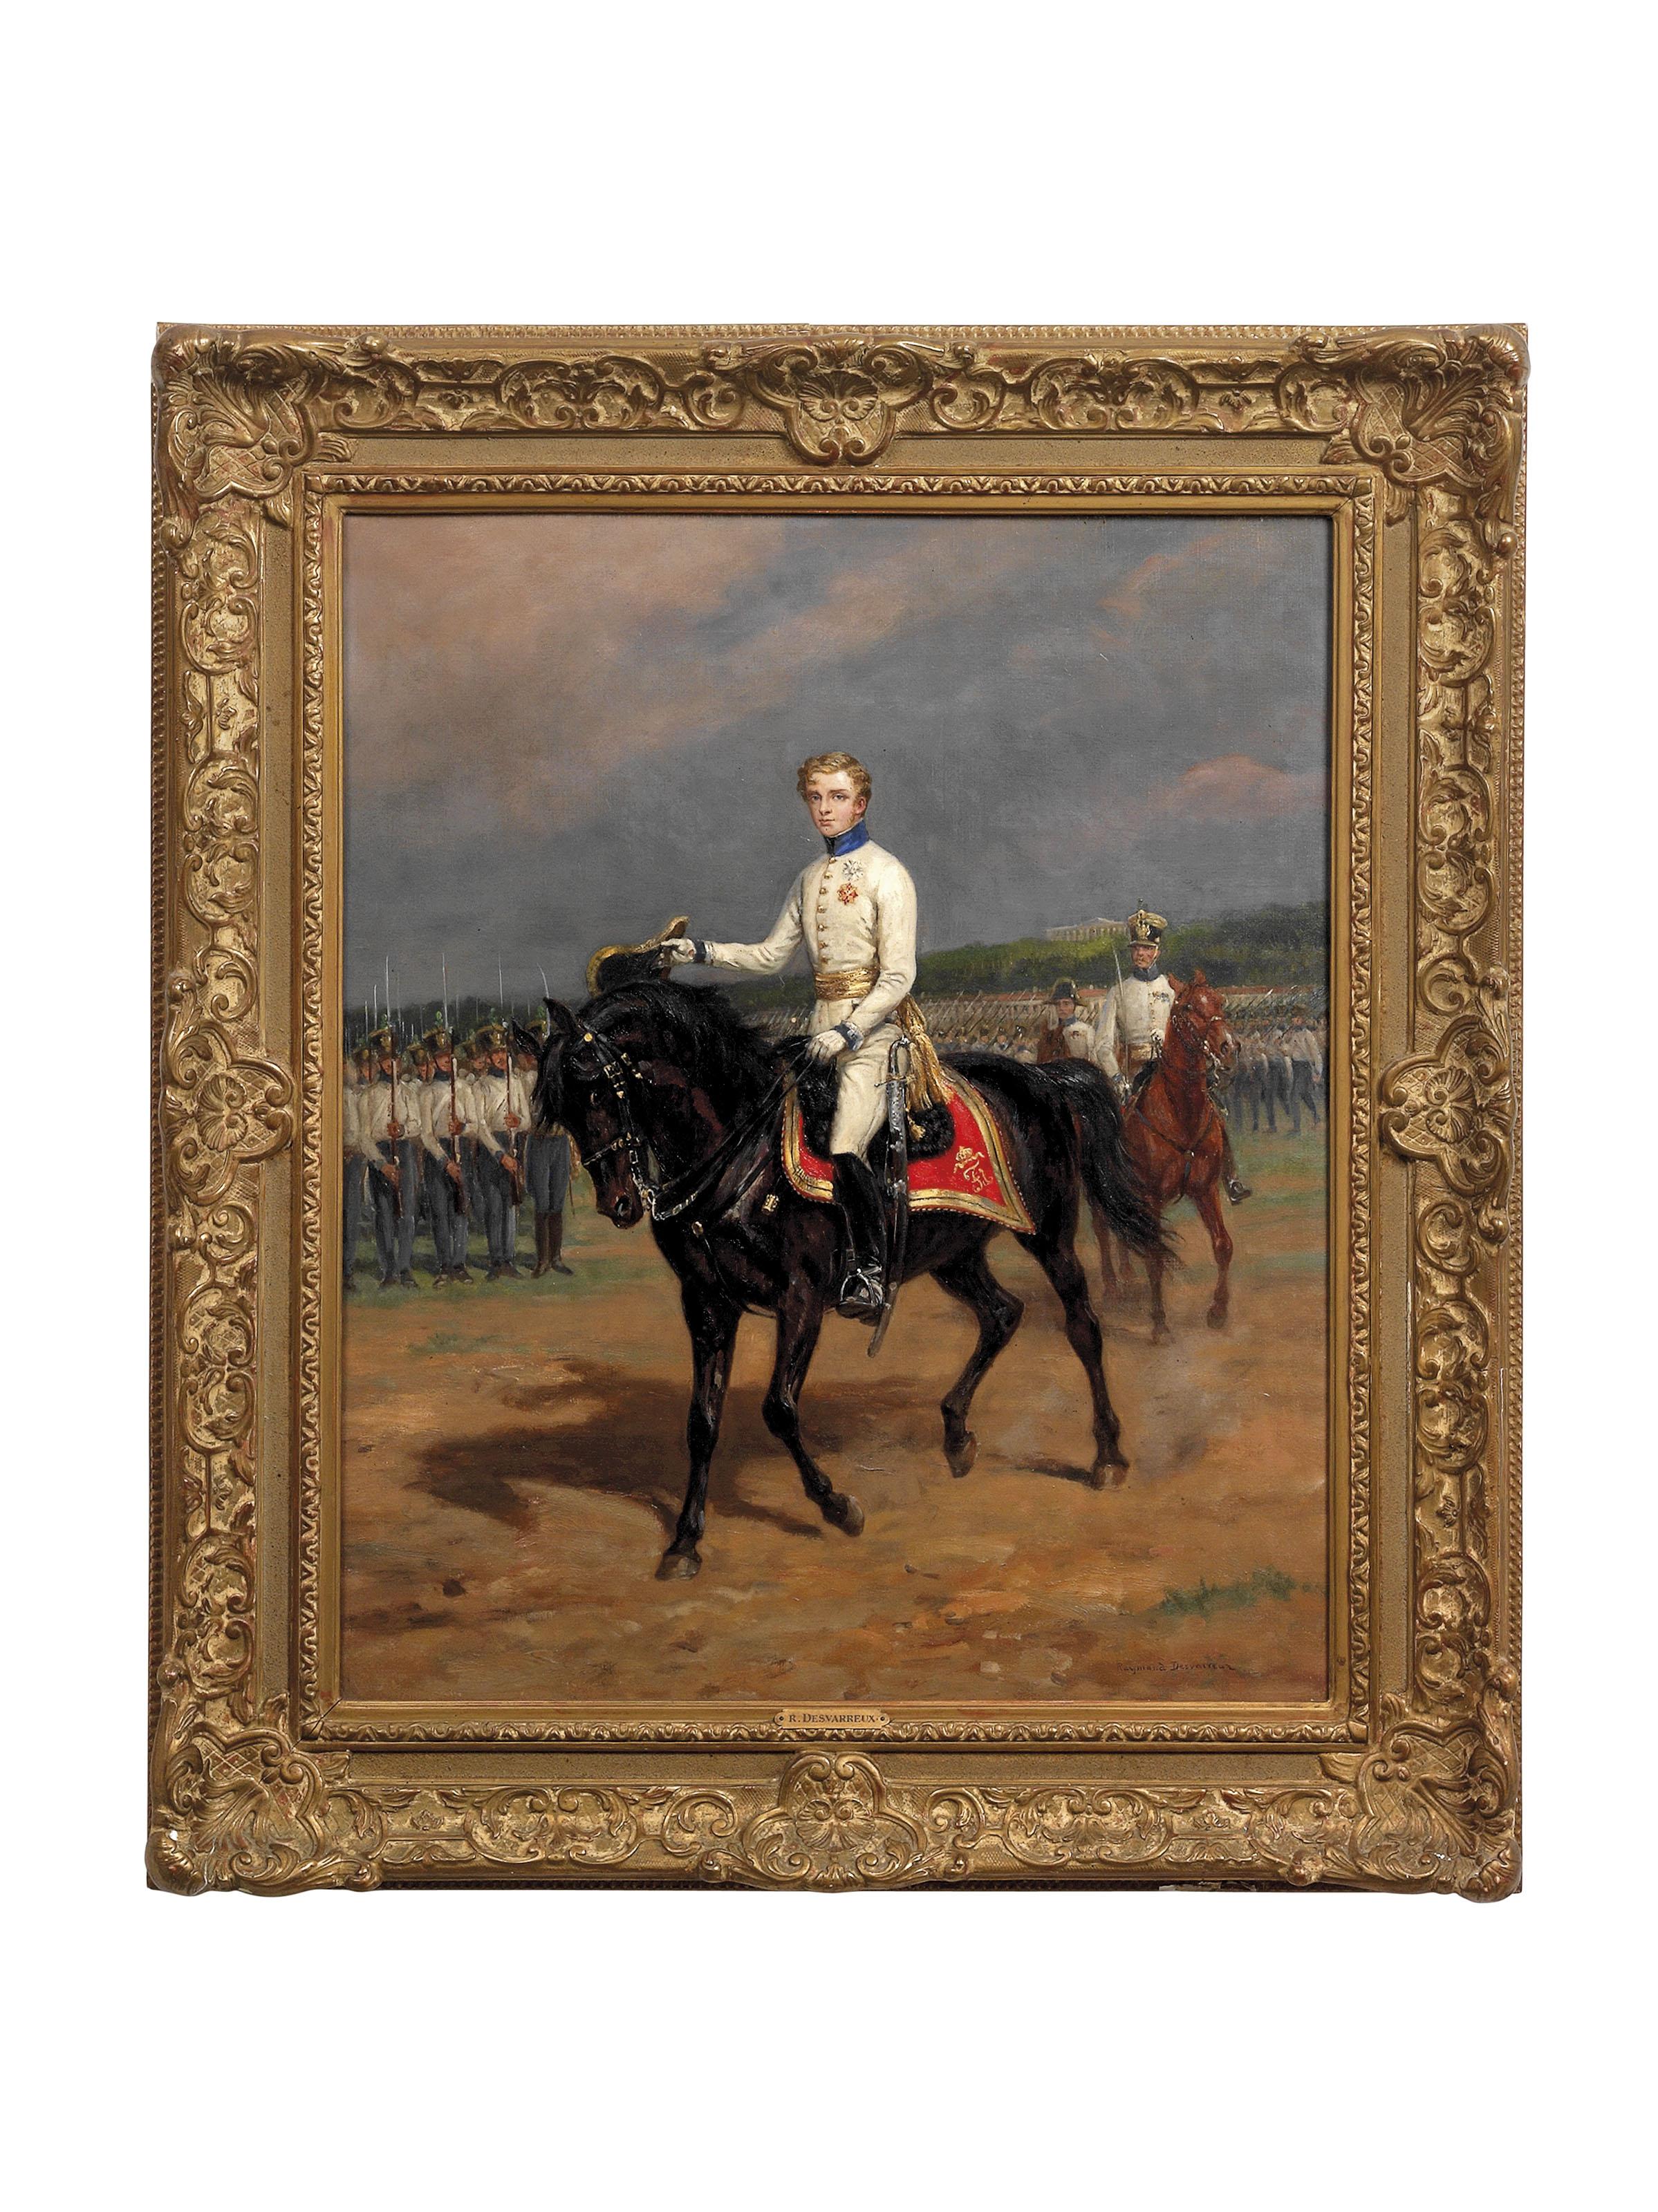 Portrait of Napoléon François Charles Joseph Bonaparte, Prince Imperial, King of Rome, Prince of Parma (1811 – 1832), small full-length, on horseback